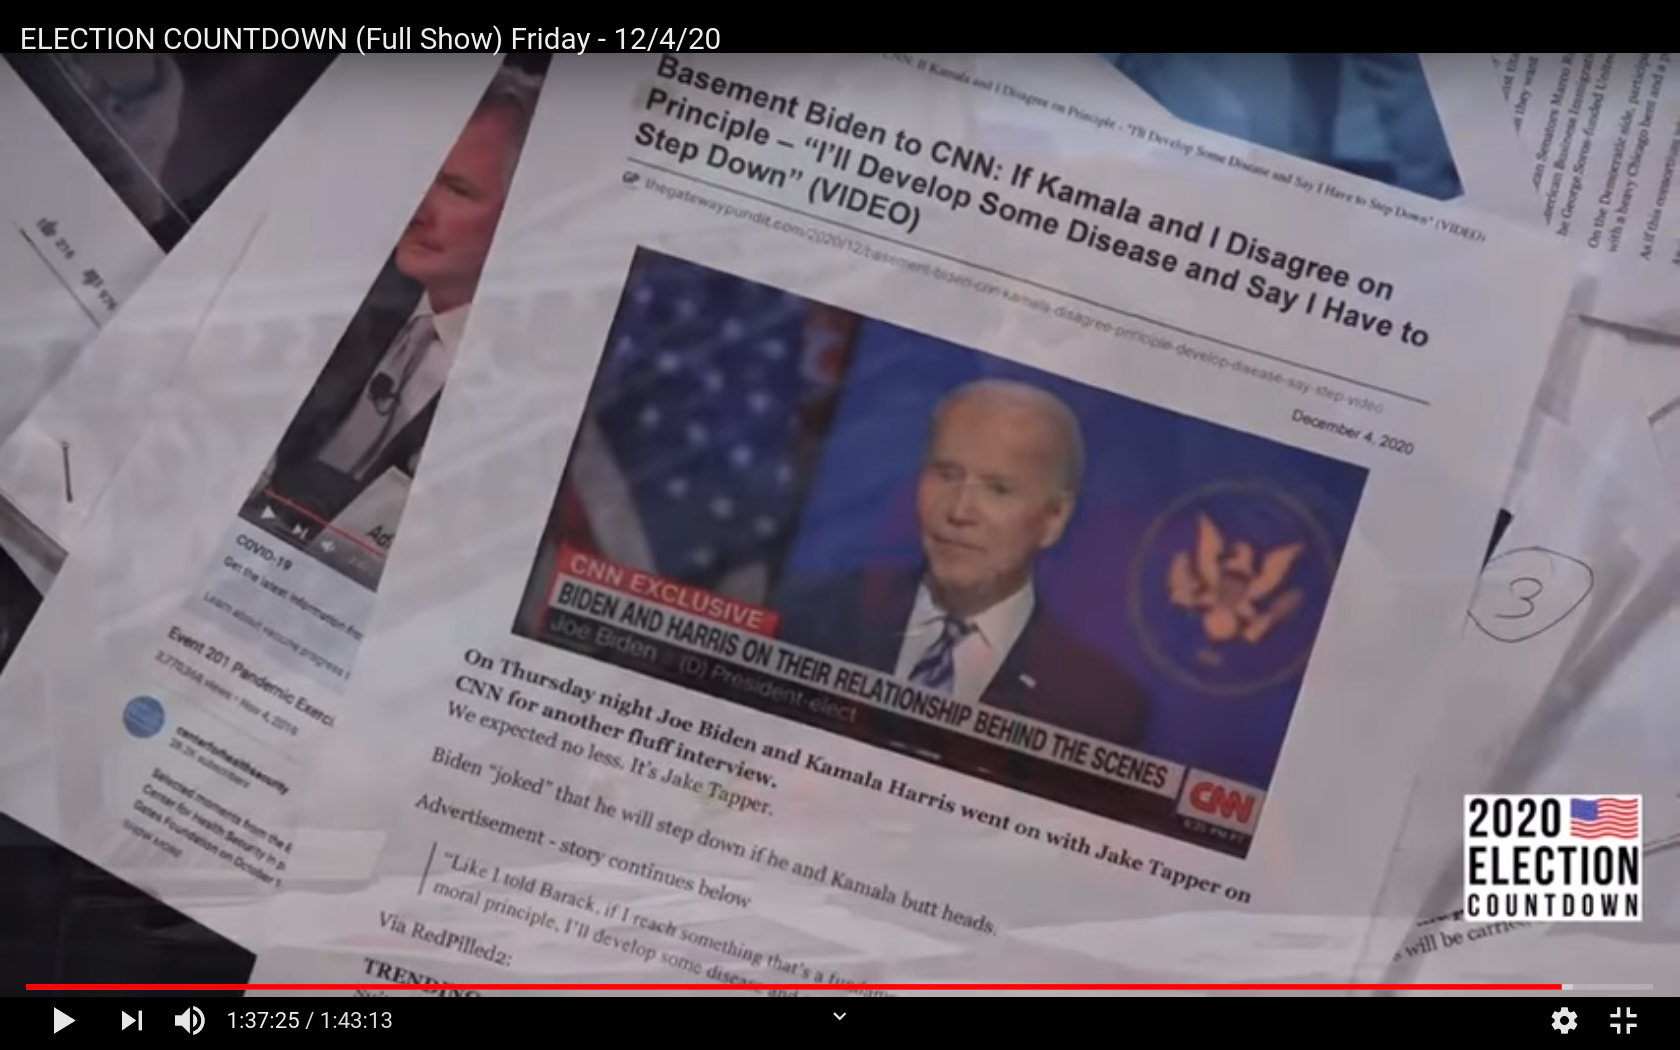 Screenshot at 2020-12-05 16:03:06 Biden to CNN, develop disease and step down.png